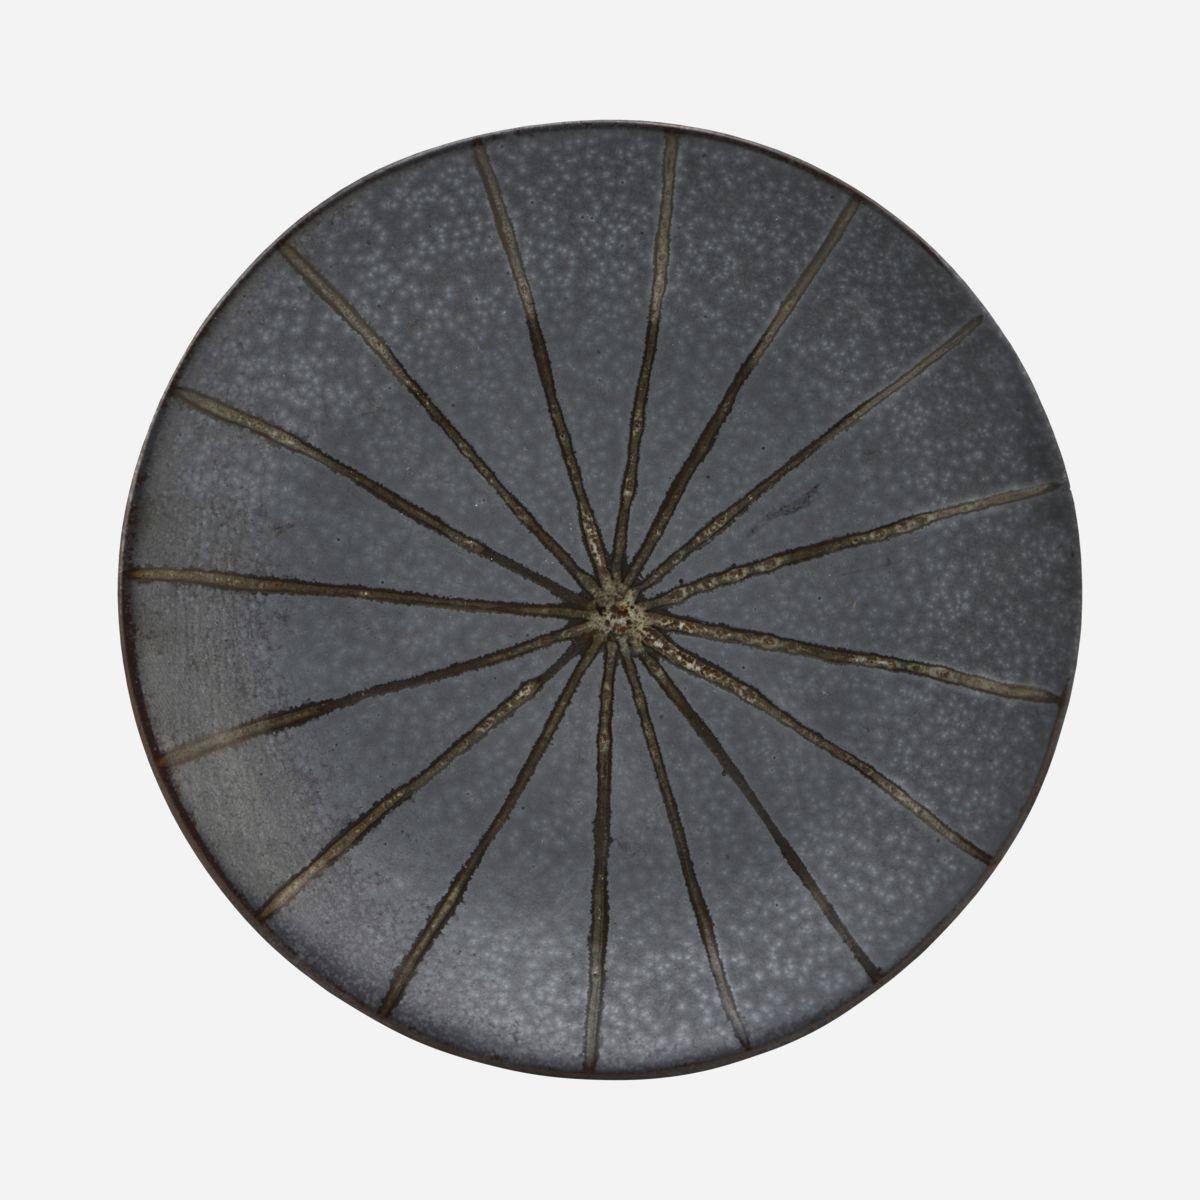 Bord suns dark brown-1